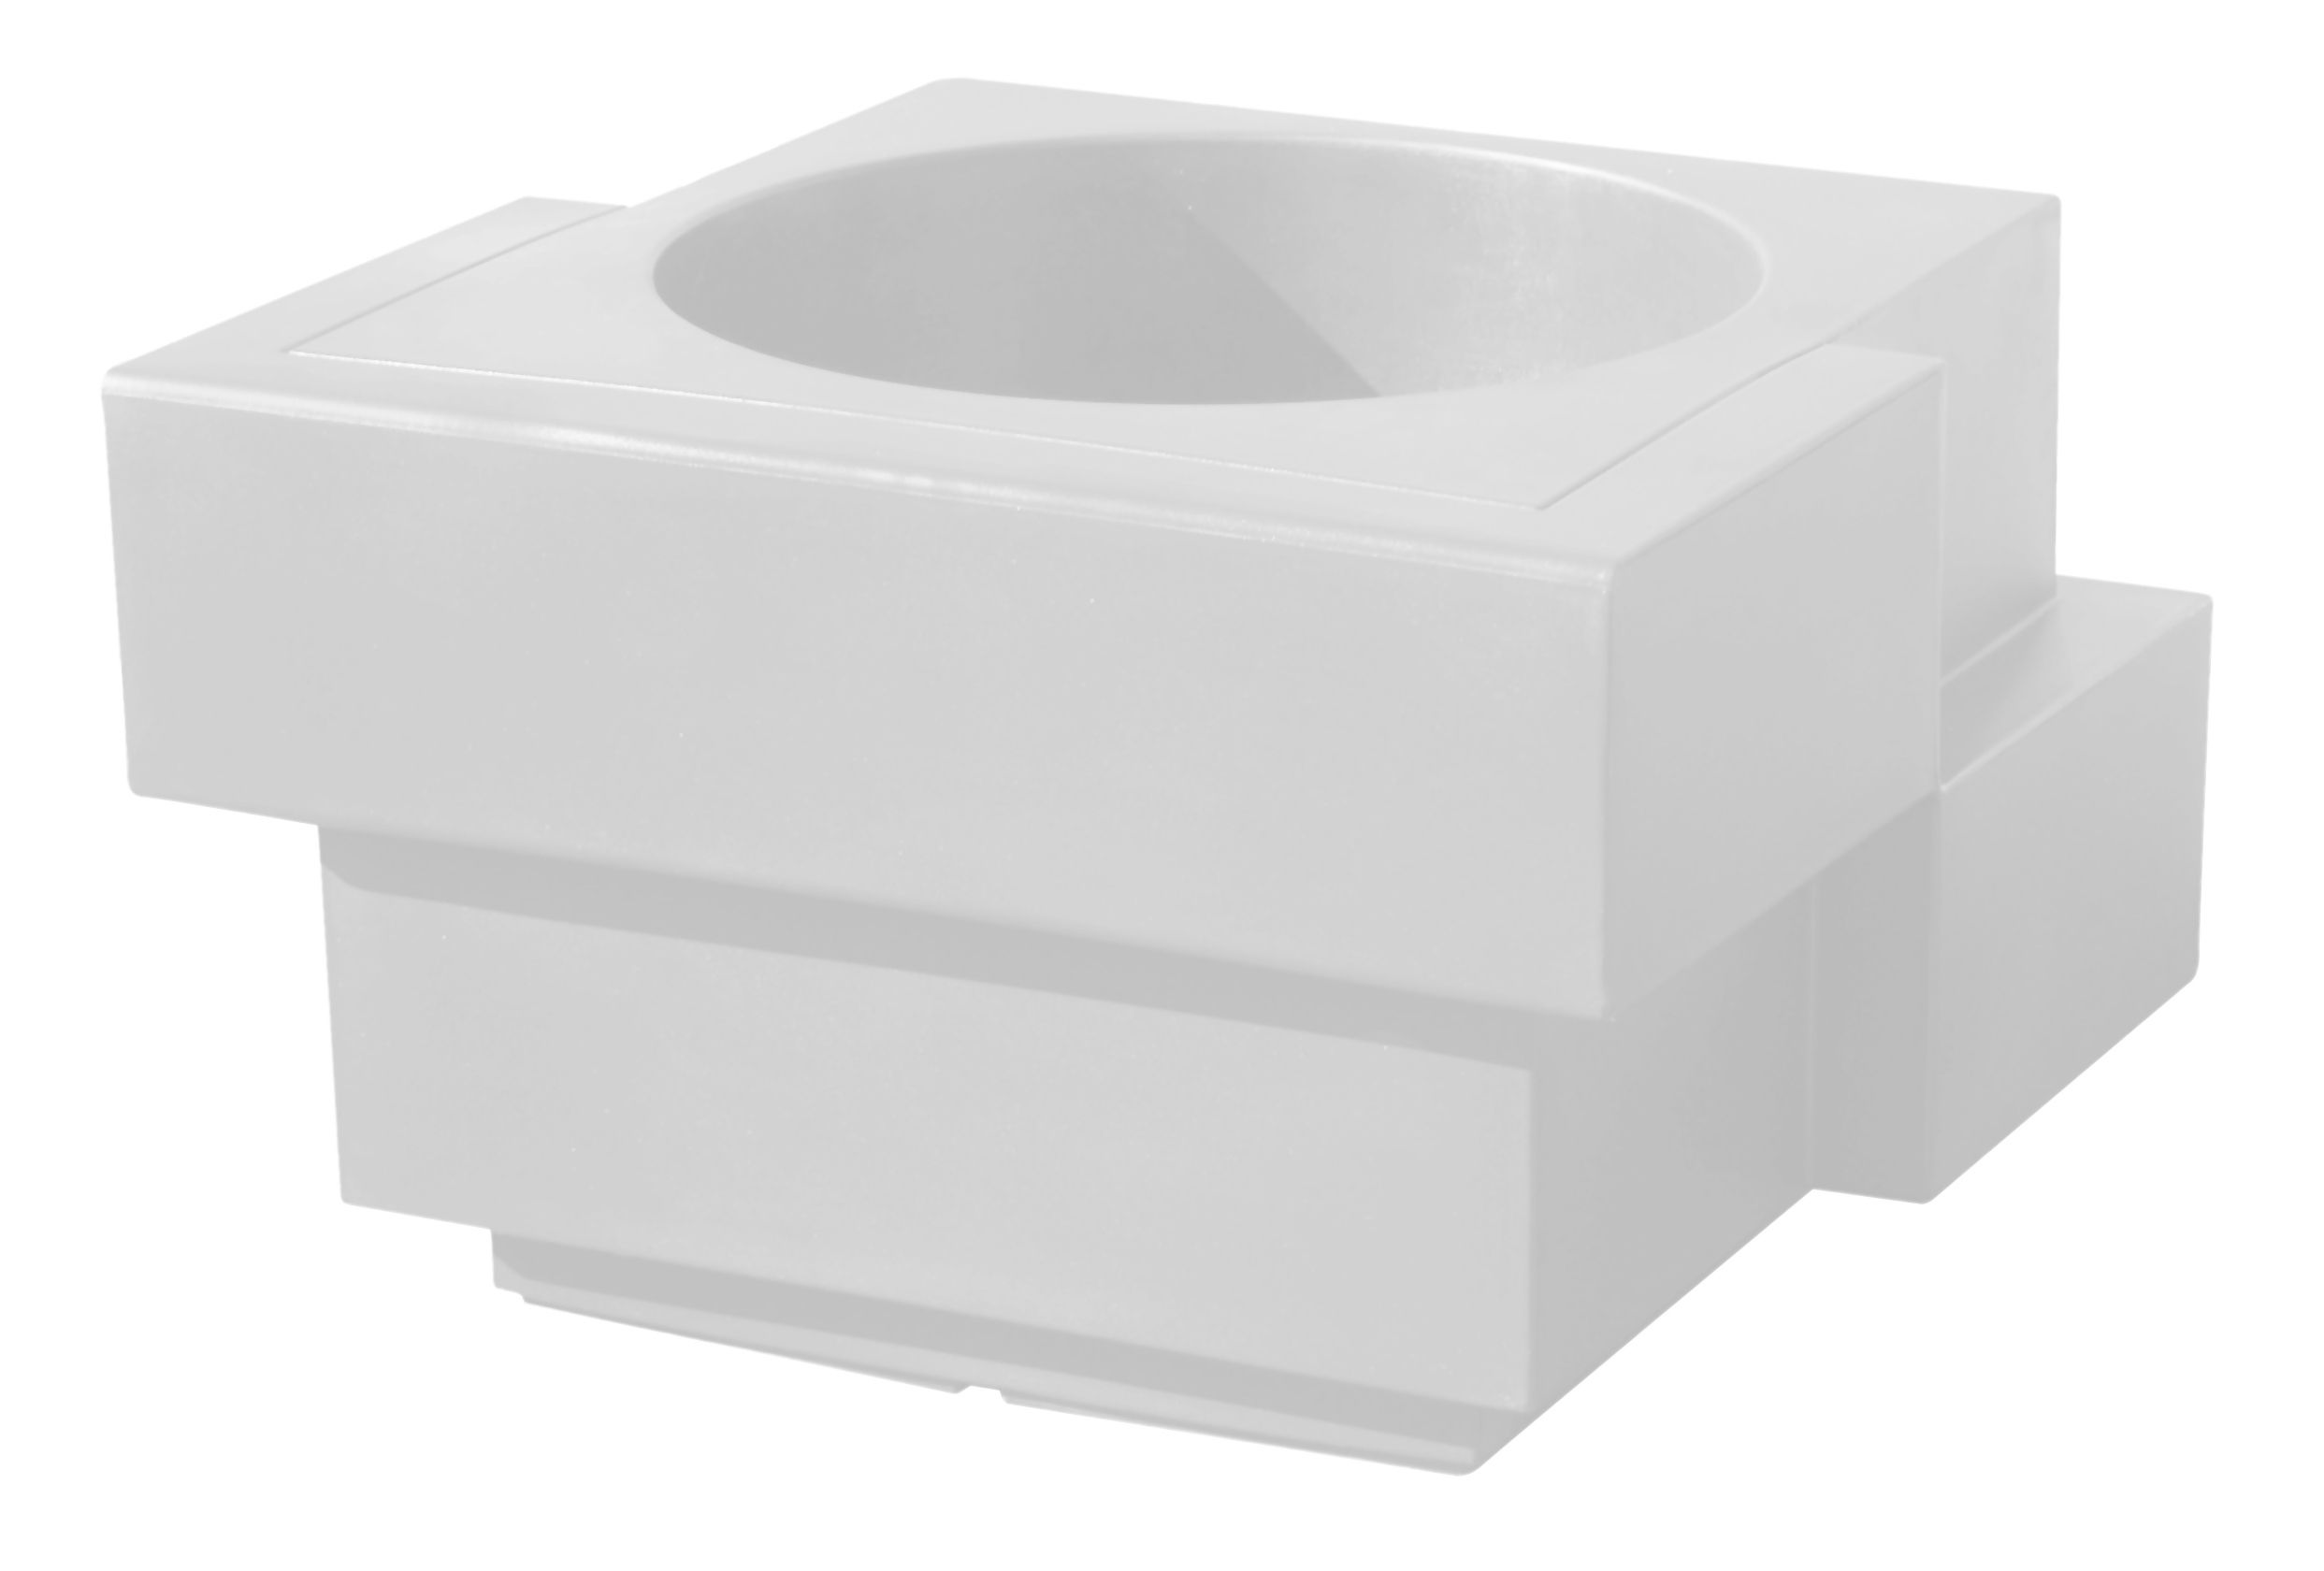 Möbel - Leuchtmöbel - Cubic Yo Lumineux leuchtender Blumentopf - Slide - Weiß - Polyäthylen